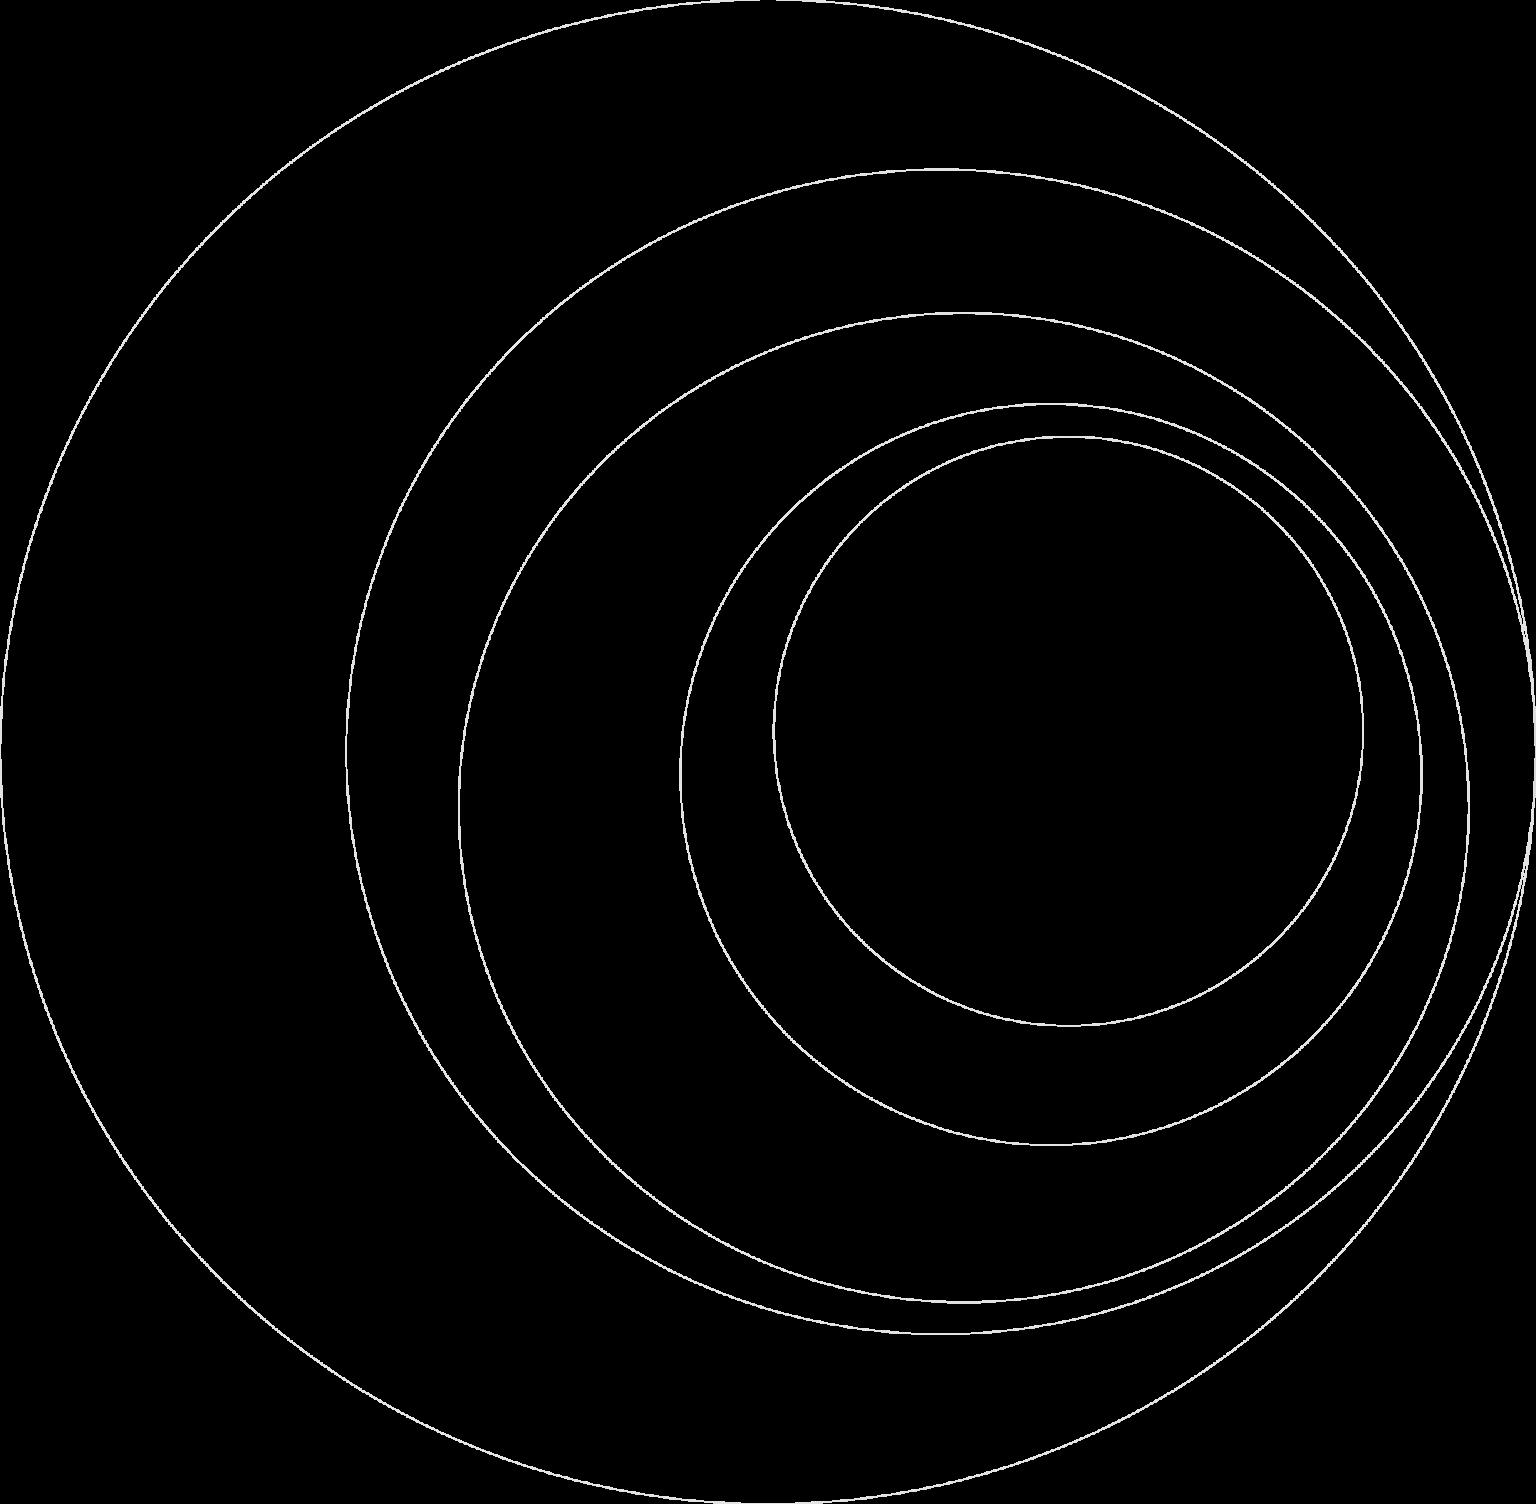 image  Hope UI – Clean Design System & Dashboard Big Circles pao8ugfm5qomgakujb2pxhkiwl5s3fuln2hm8juy0w